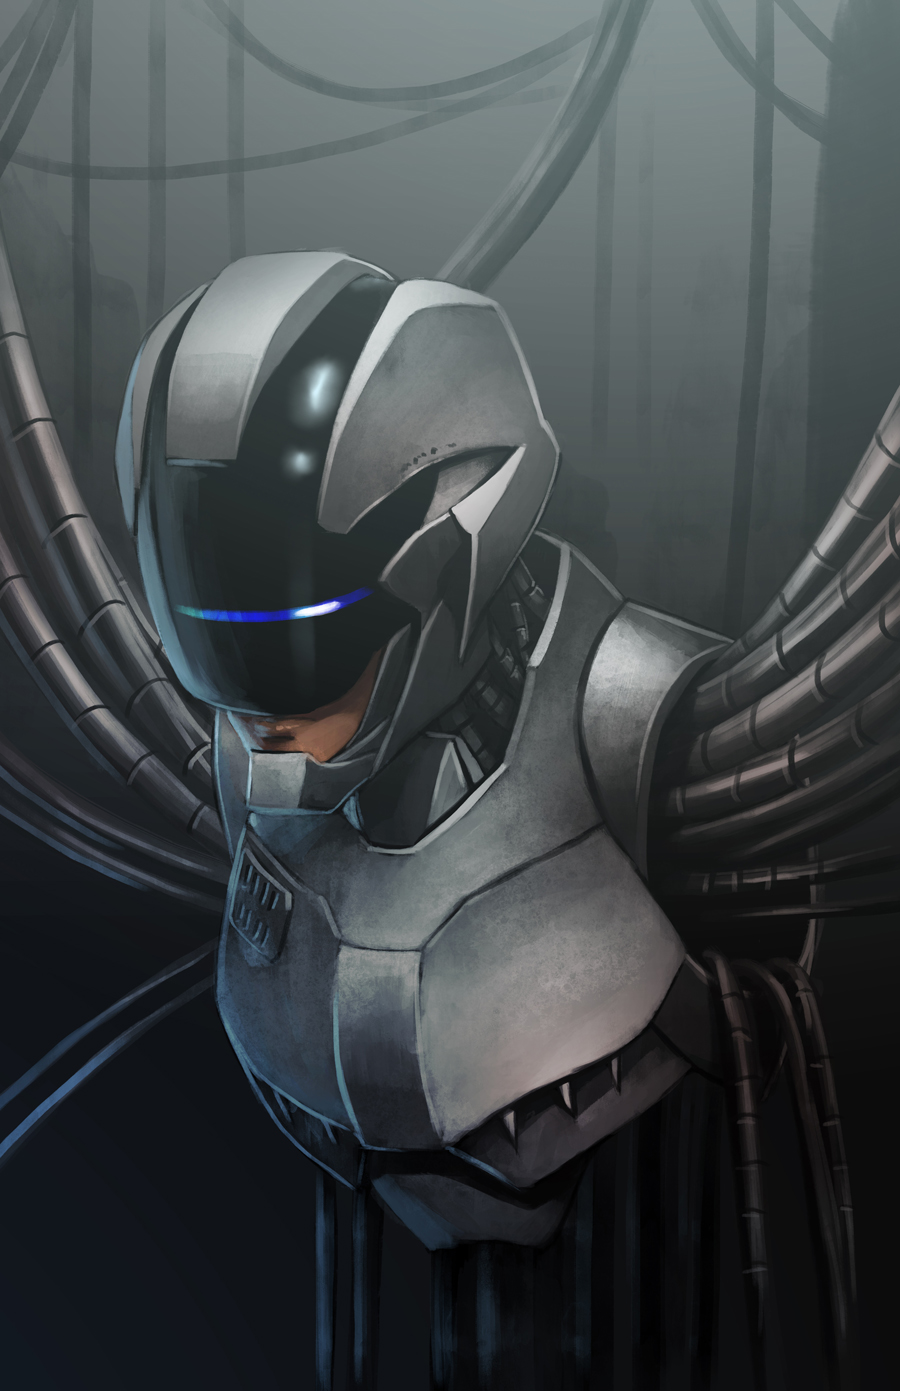 Robocop by MaHenBu